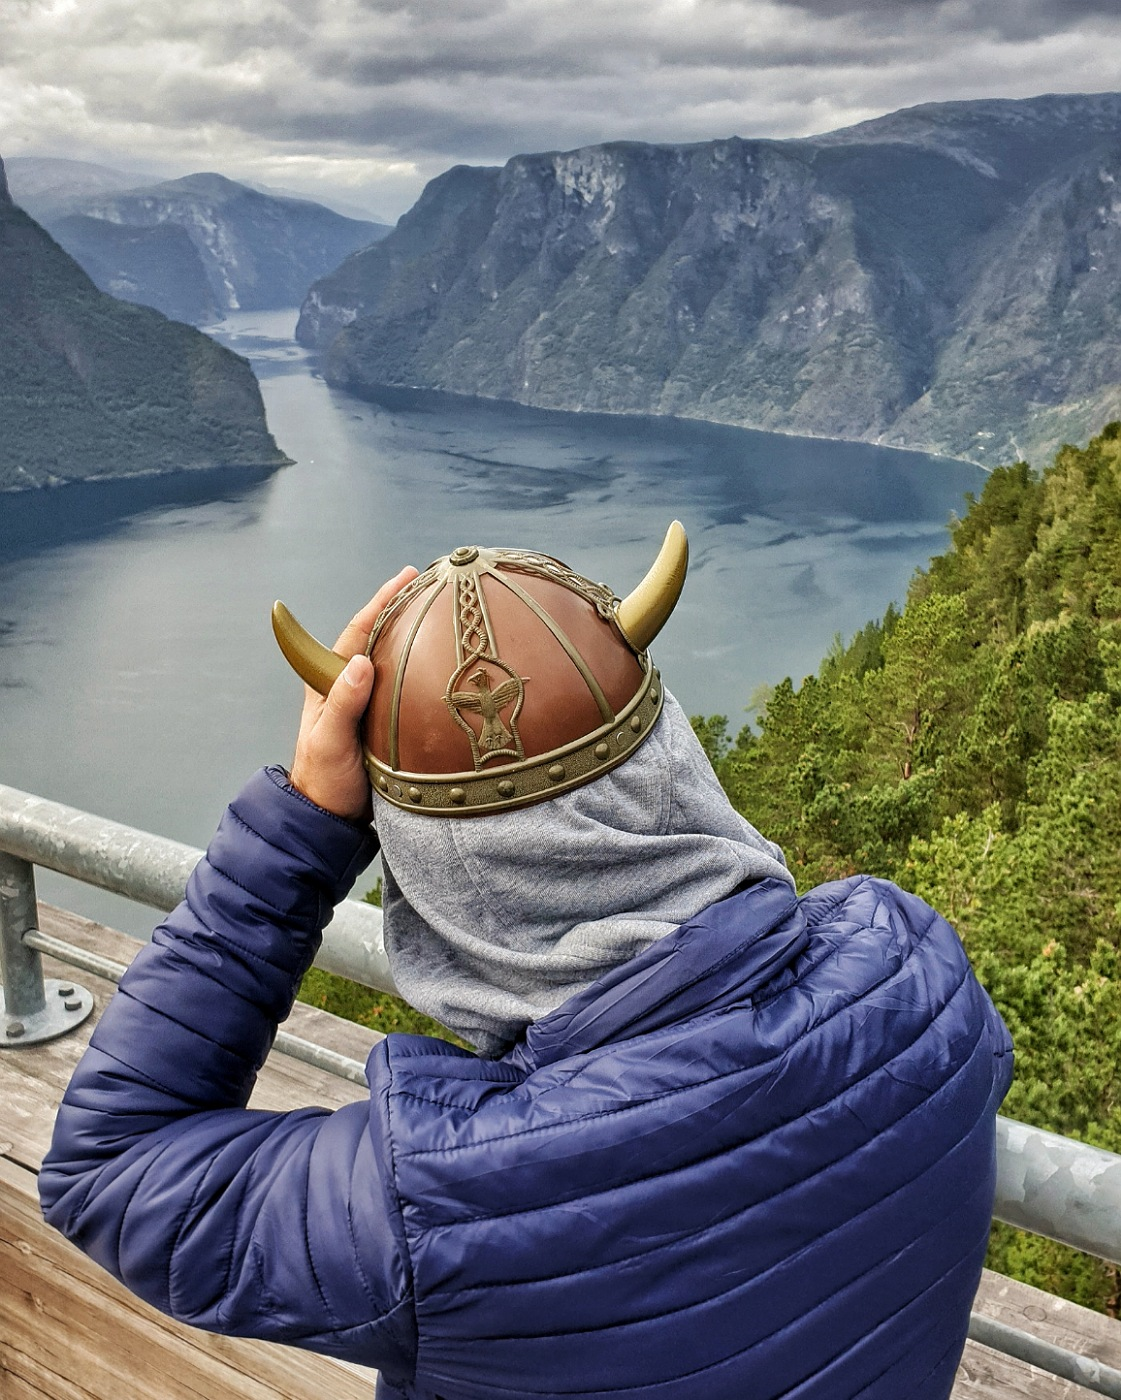 stegastein viepoint flam norvegia